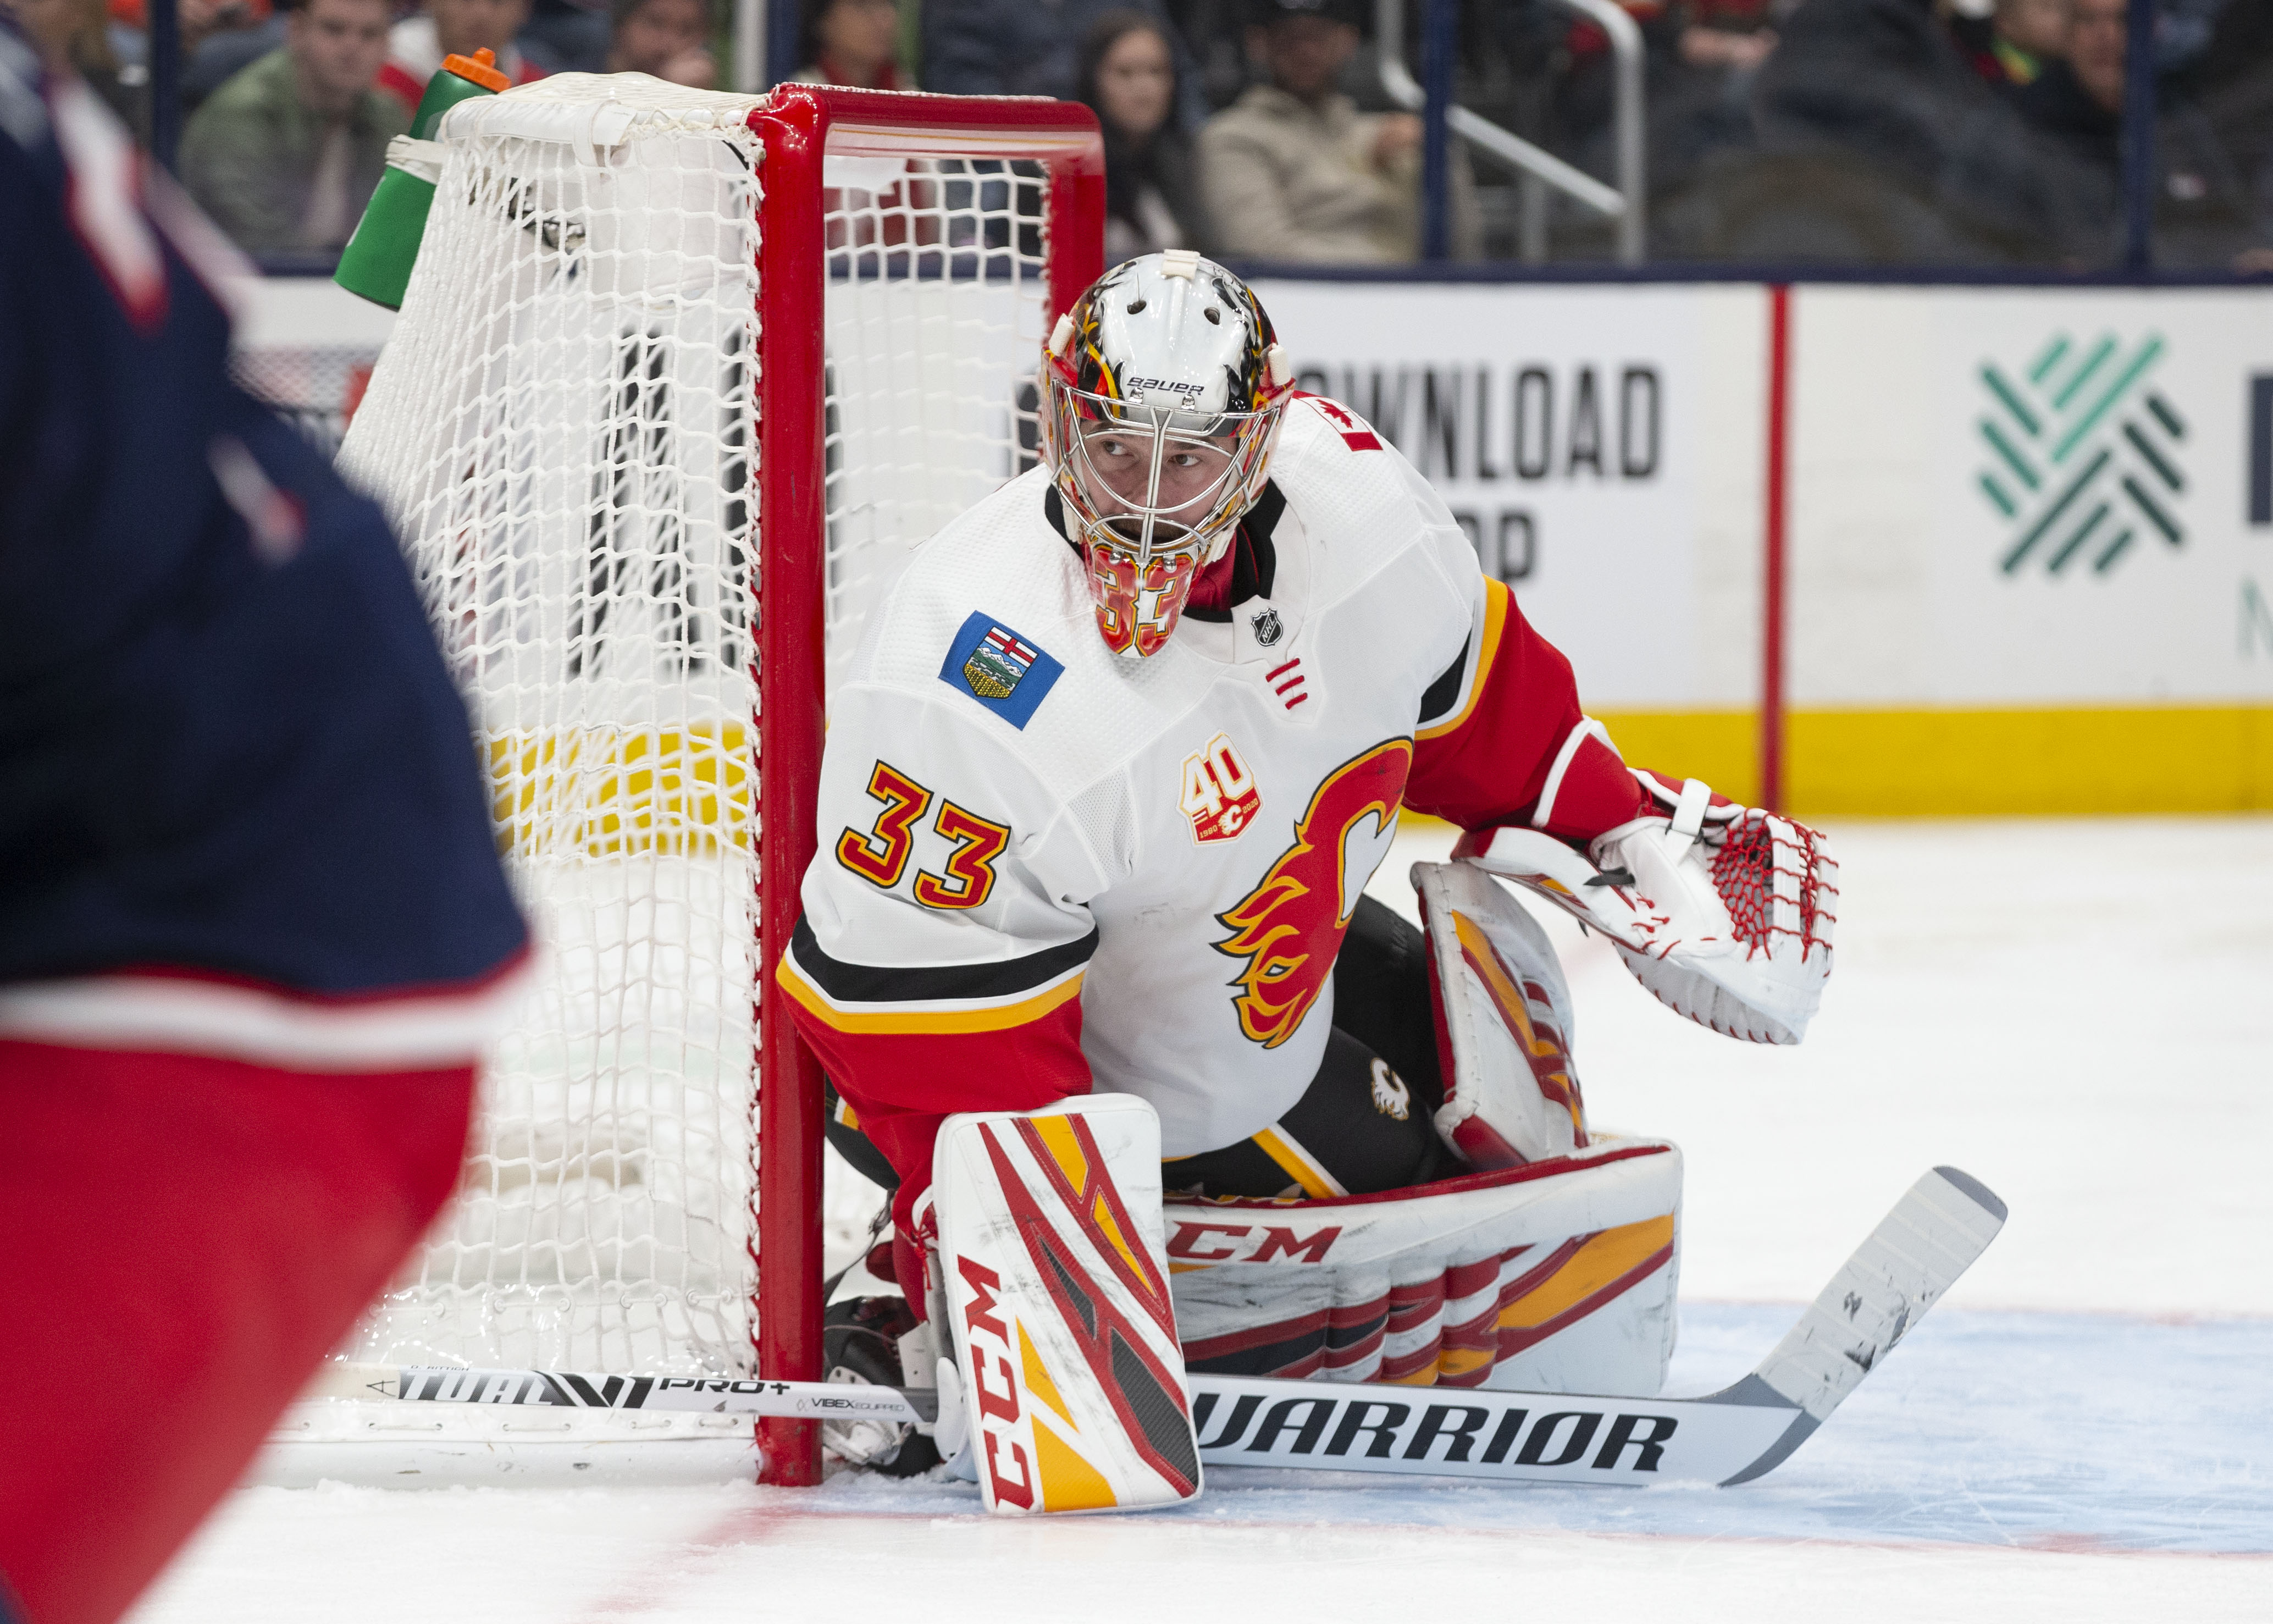 Dave Rittich records notable shutout for the Calgary Flames